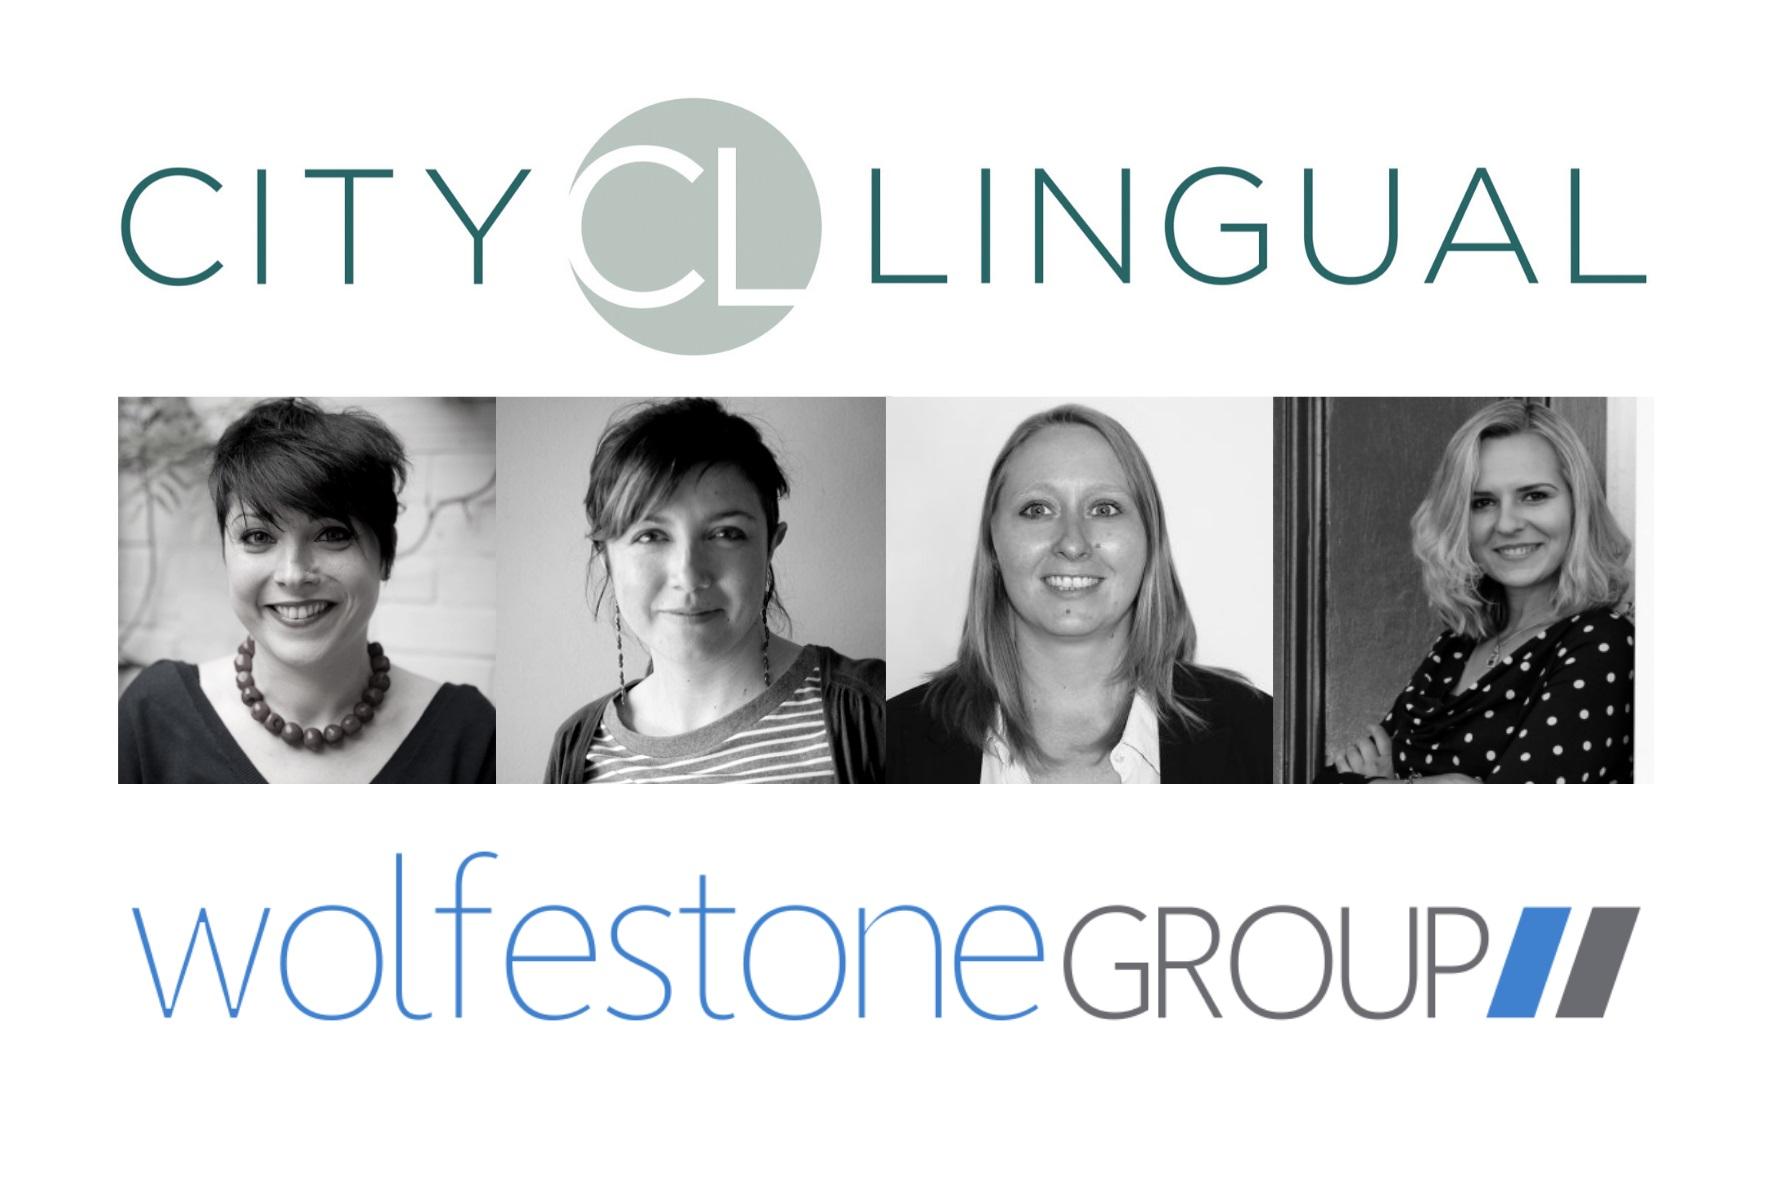 The Wolfestone Group and City Lingual logos with photos of Anna Bastek, Alex Michelle-Parr, Margherita Baldisserri and Sara Ceccarelli